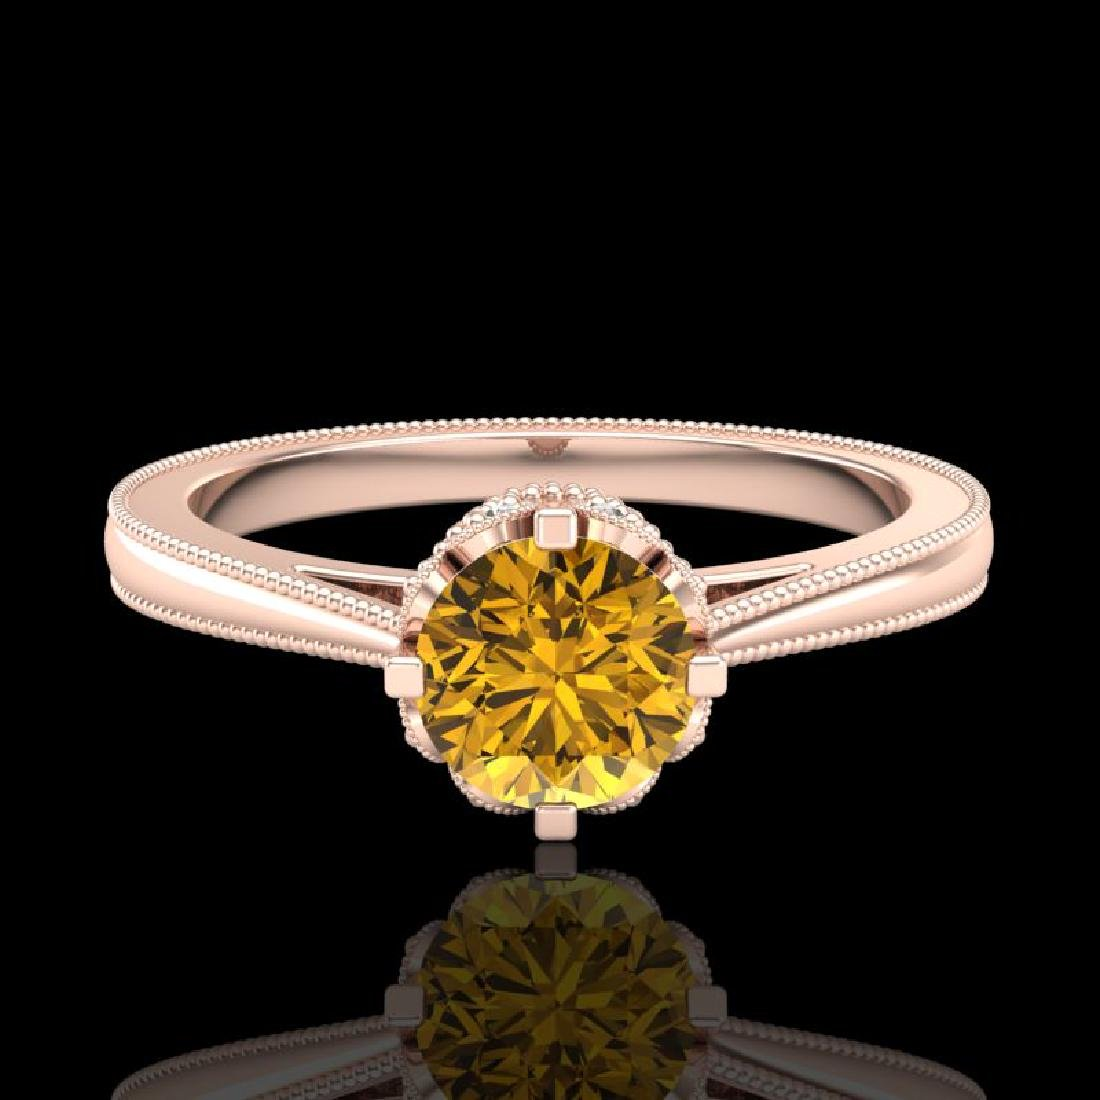 0.81 CTW Intense Fancy Yellow Diamond Engagement Art - 2